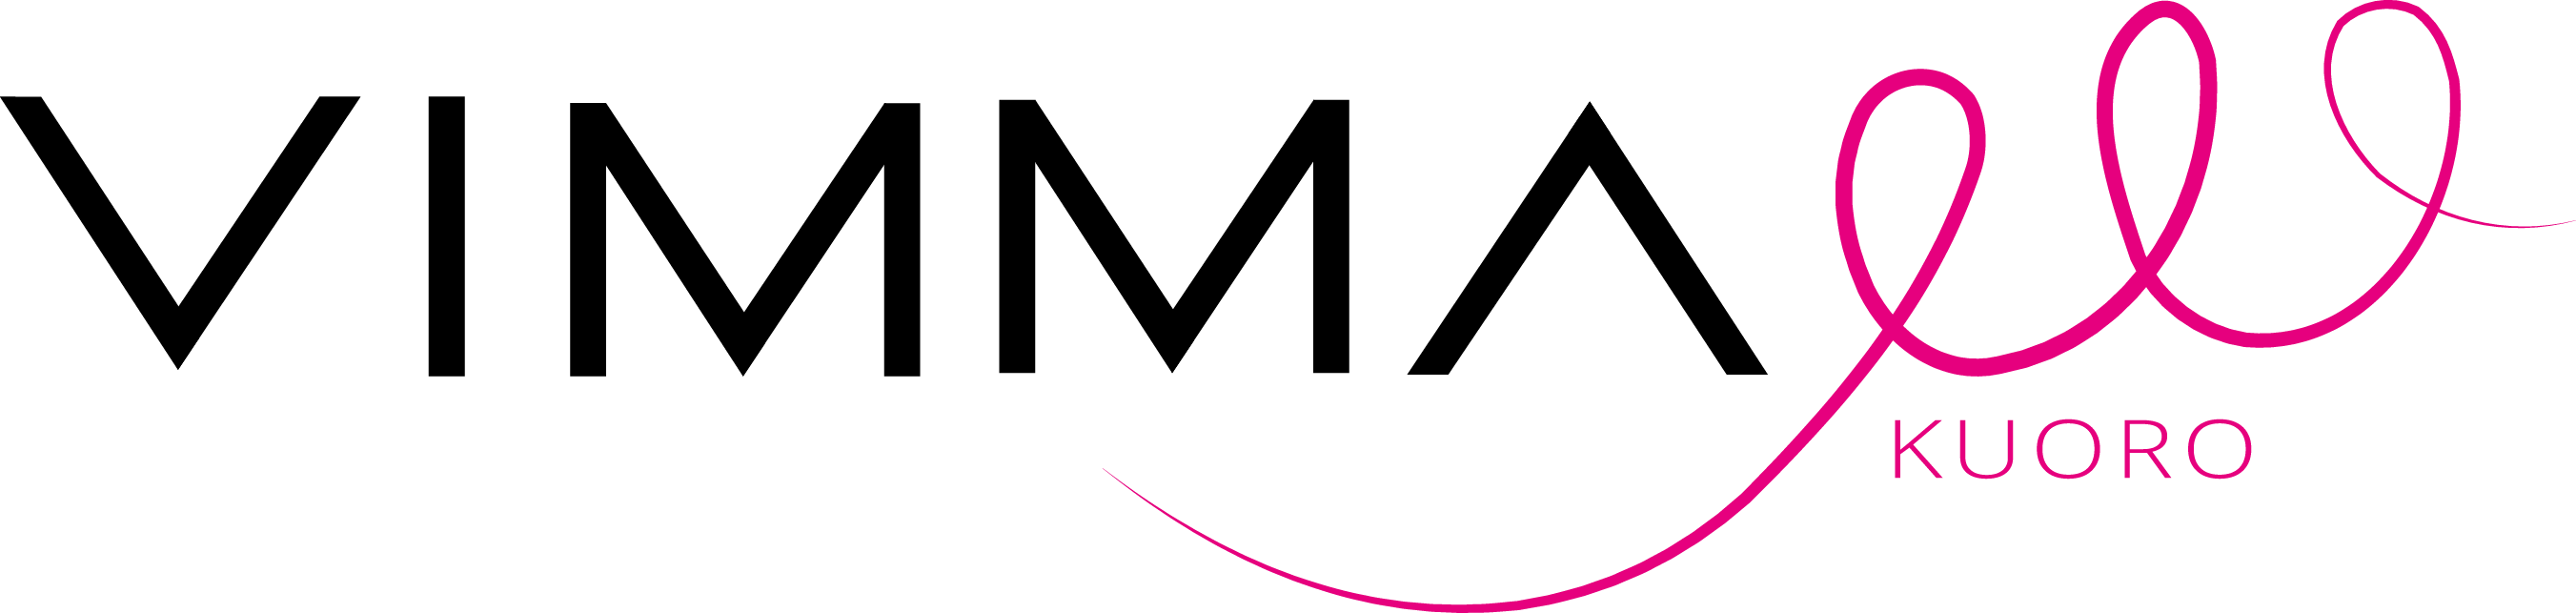 VIMMA-kuoro